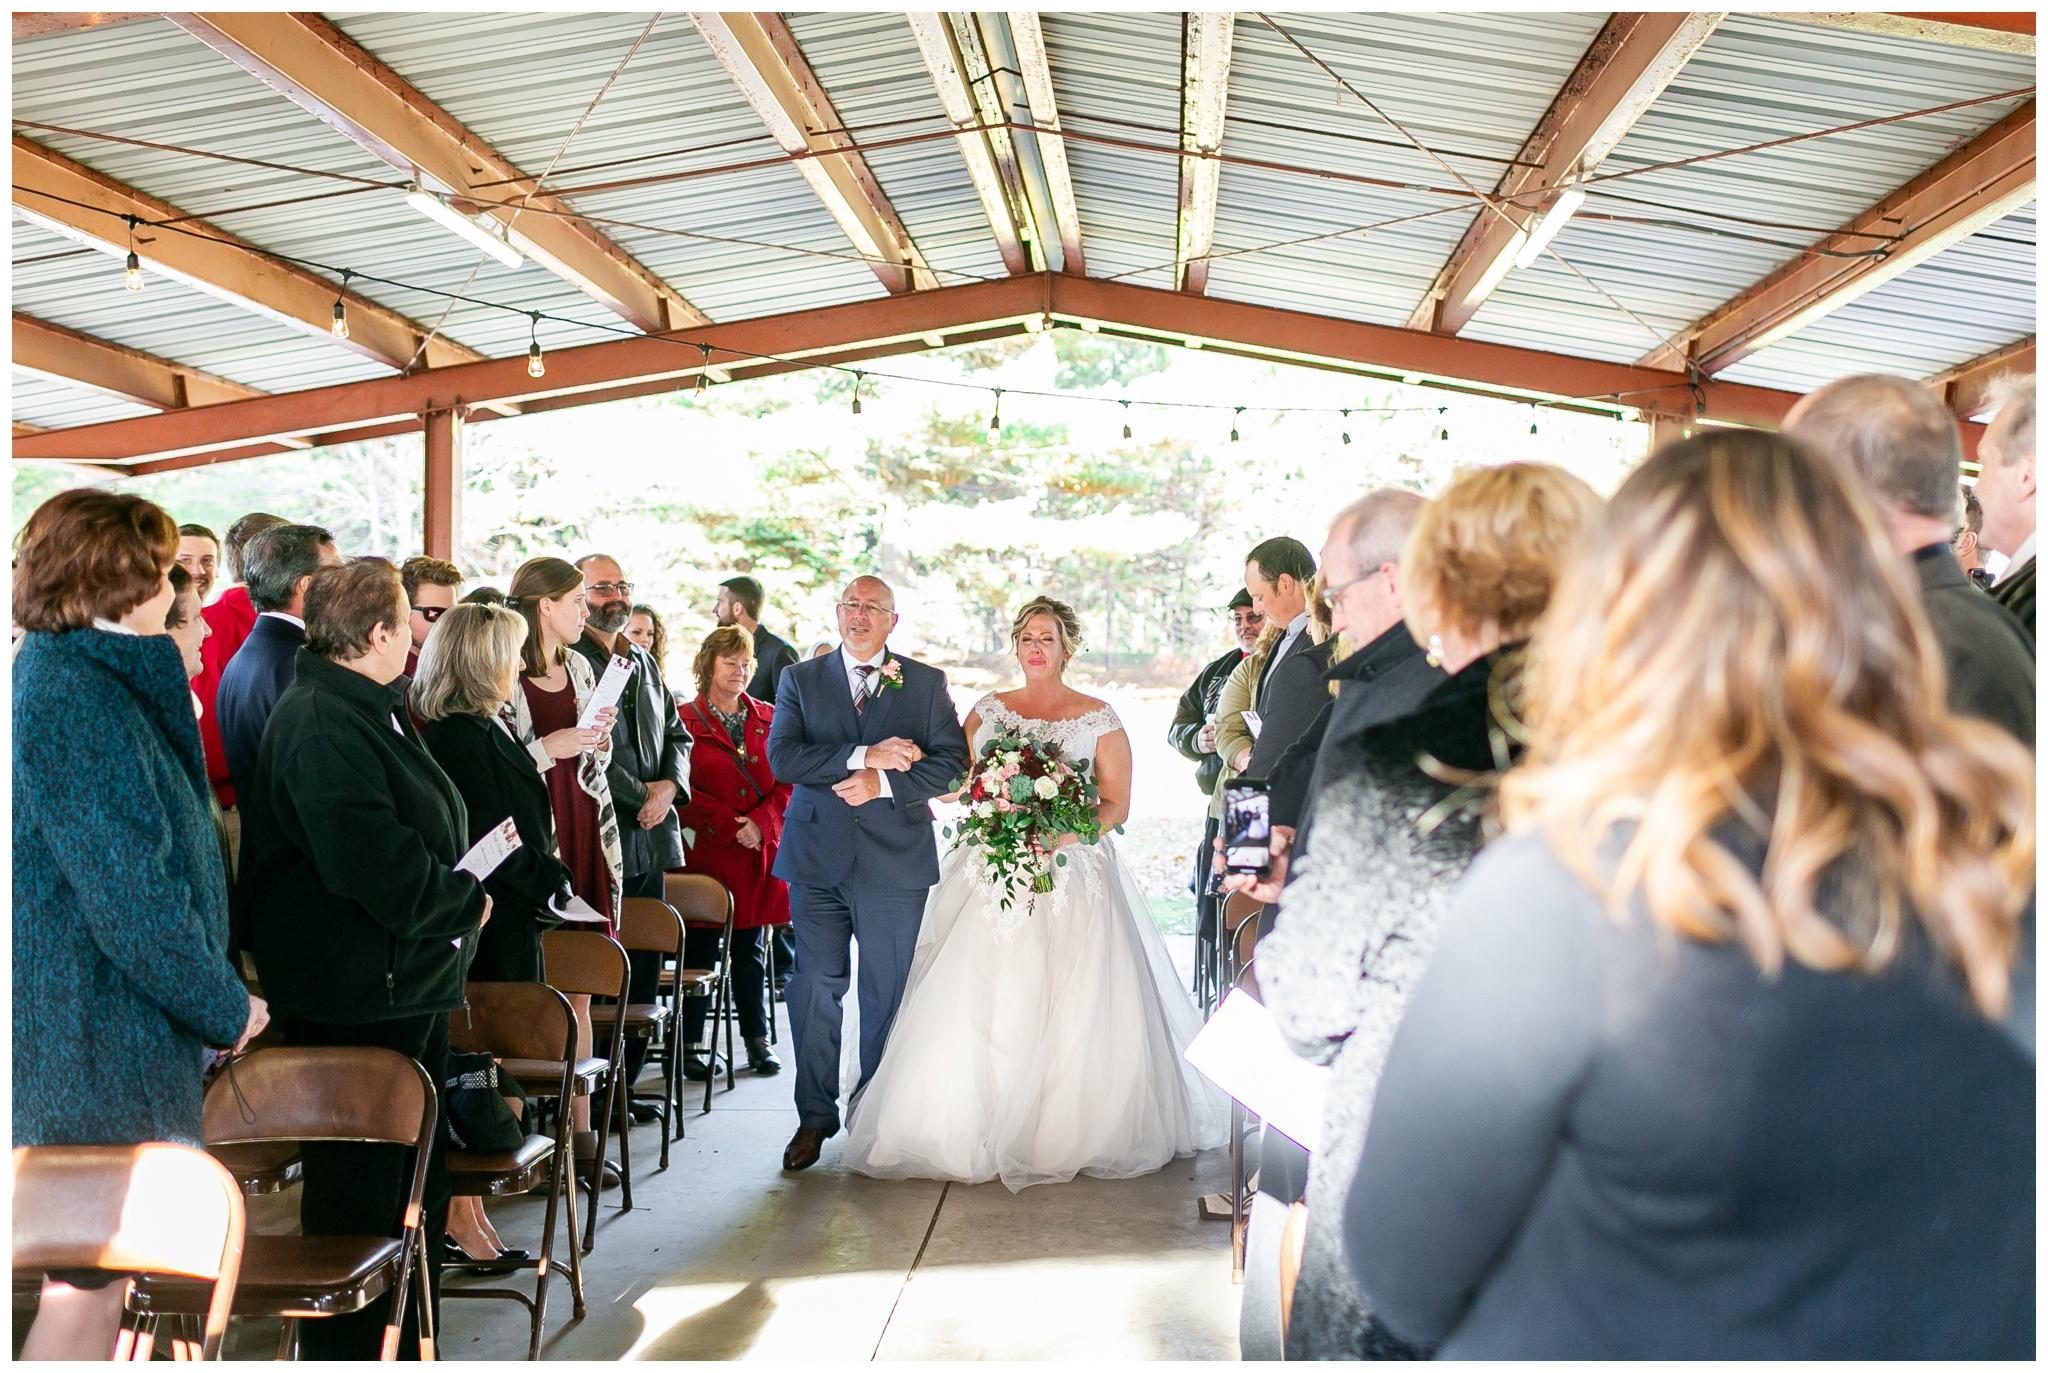 Shawano_County_park_Wedding_Caynay_Photo_Madison_Wi_2286.jpg